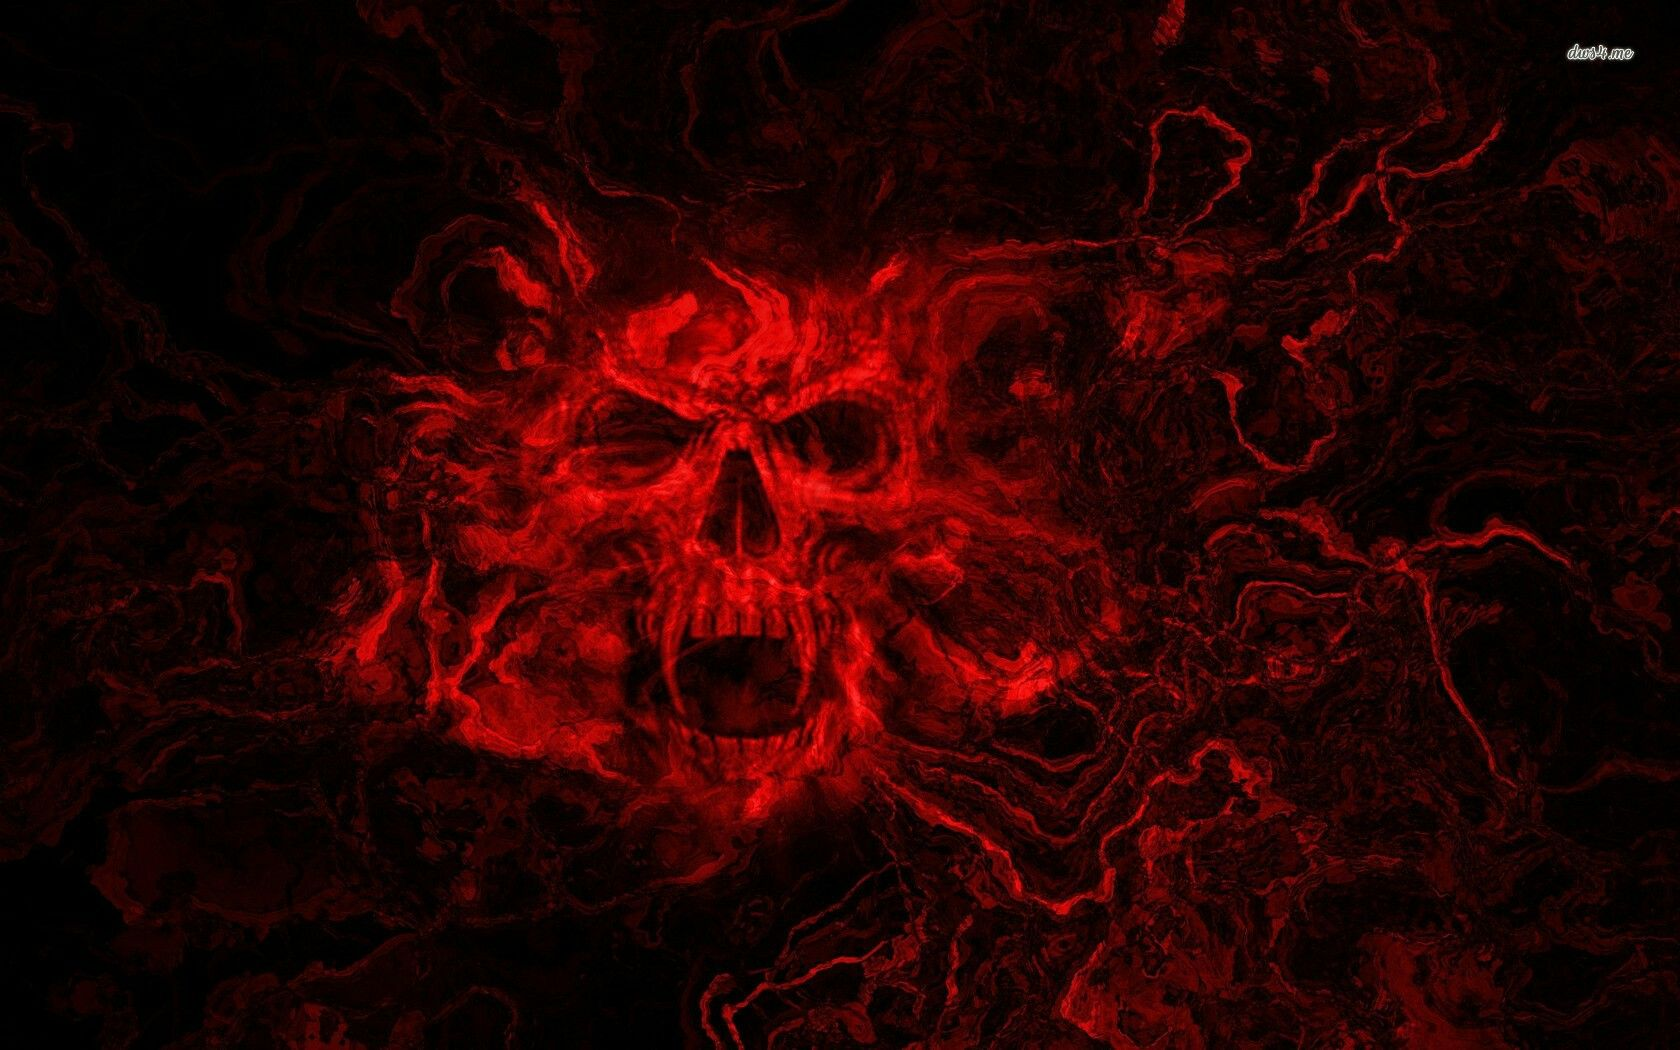 Pin By Pam On Striking Red Black Skulls Wallpaper Skull Wallpaper Skull Pictures